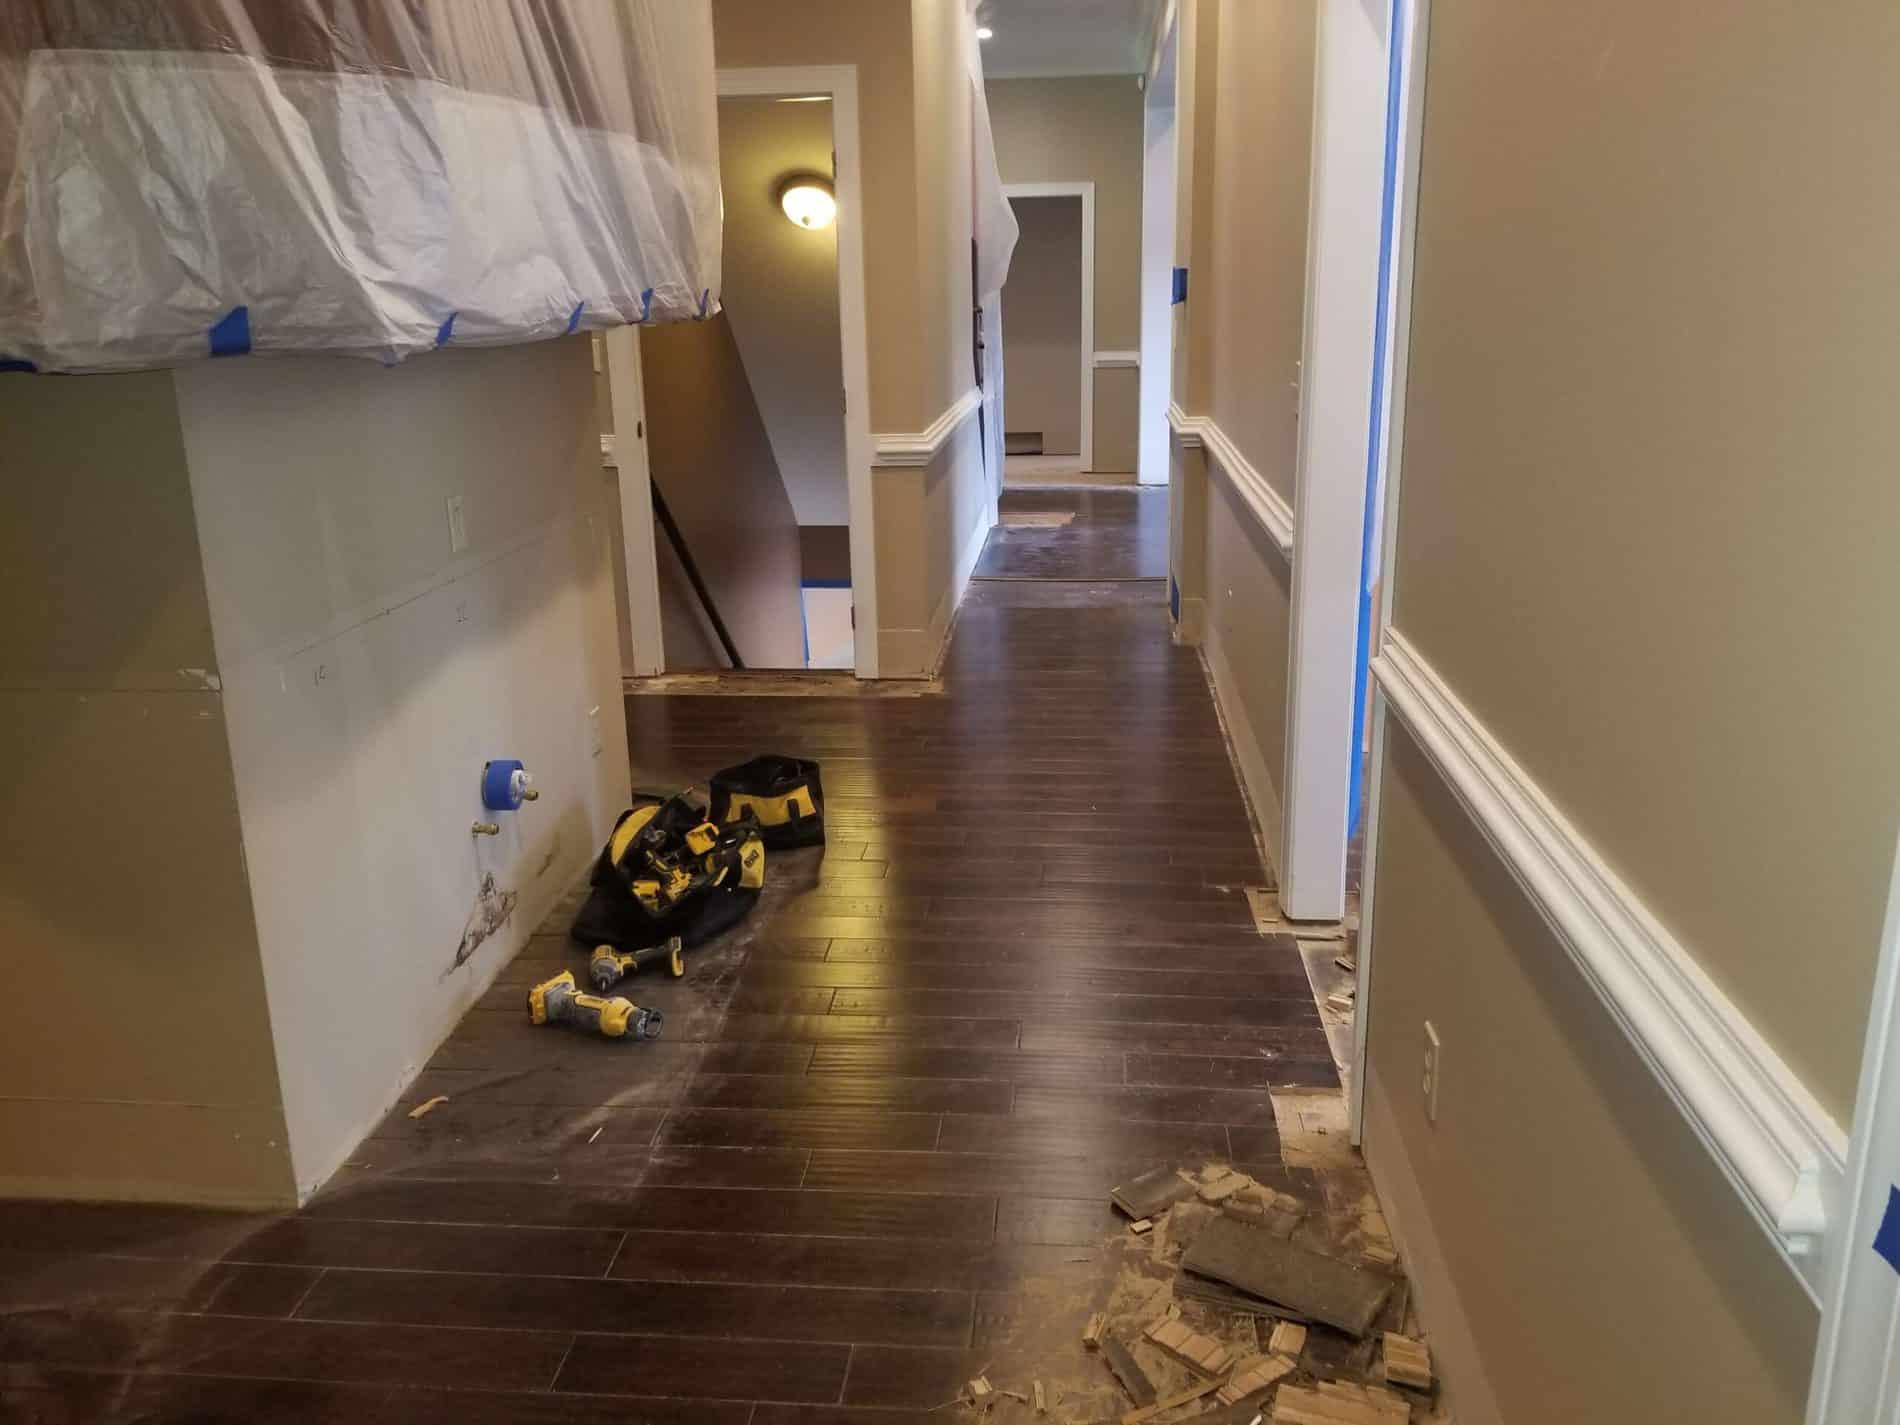 Hallway Restoration needed after water damage